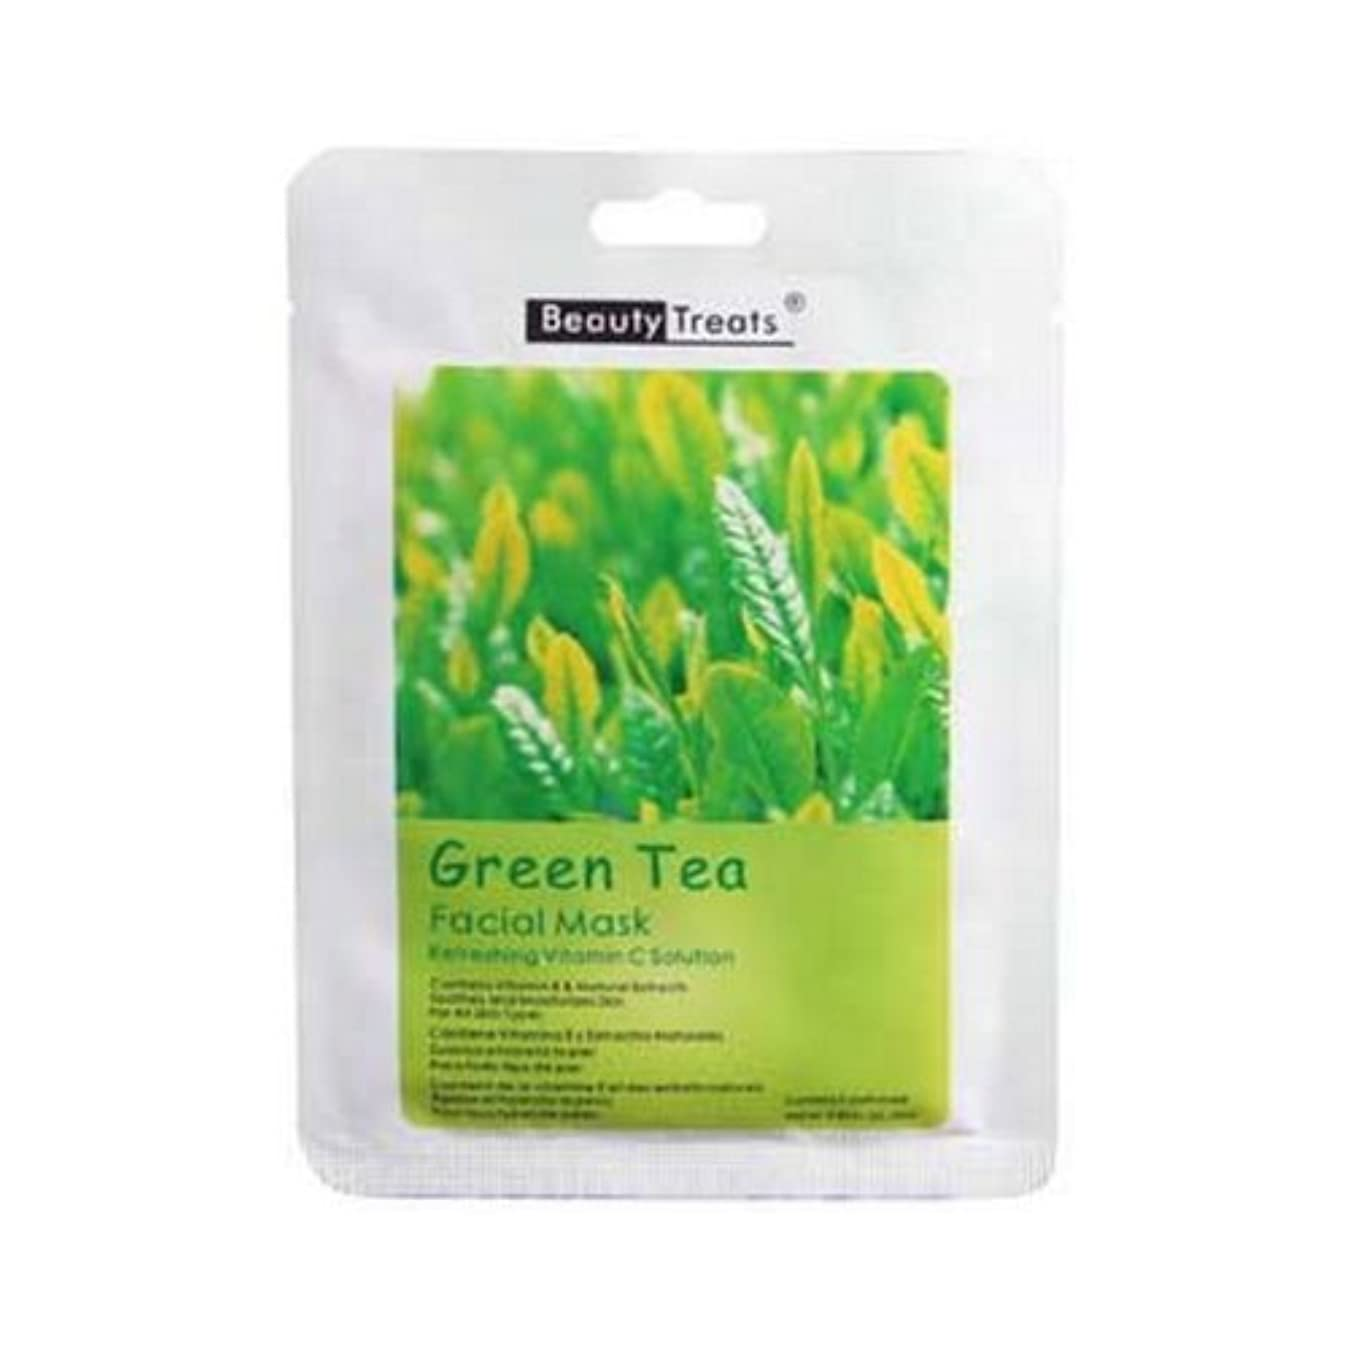 (3 Pack) BEAUTY TREATS Facial Mask Refreshing Vitamin C Solution - Green Tea (並行輸入品)